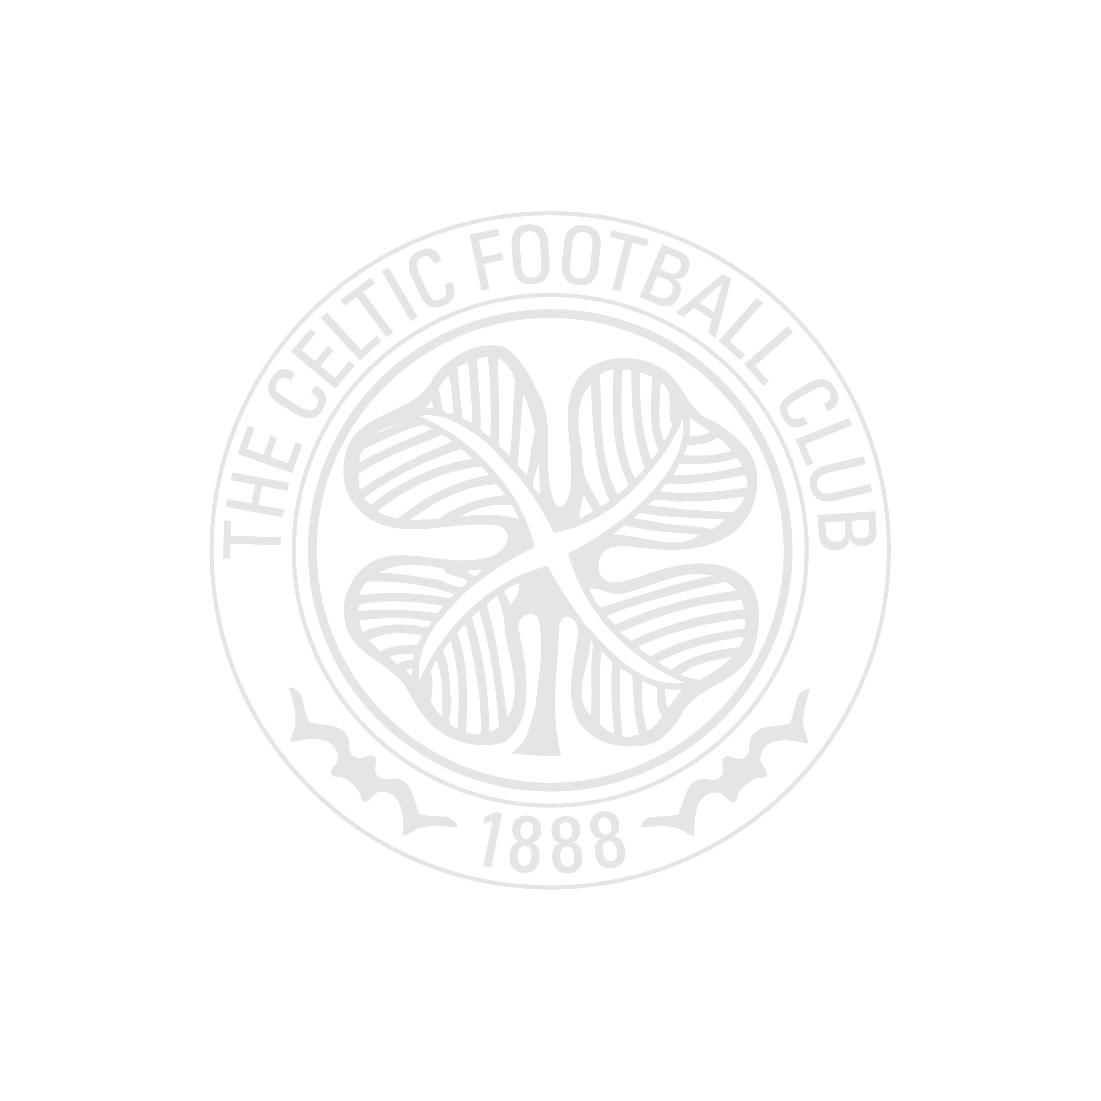 Celtic Personalised Crest Towel